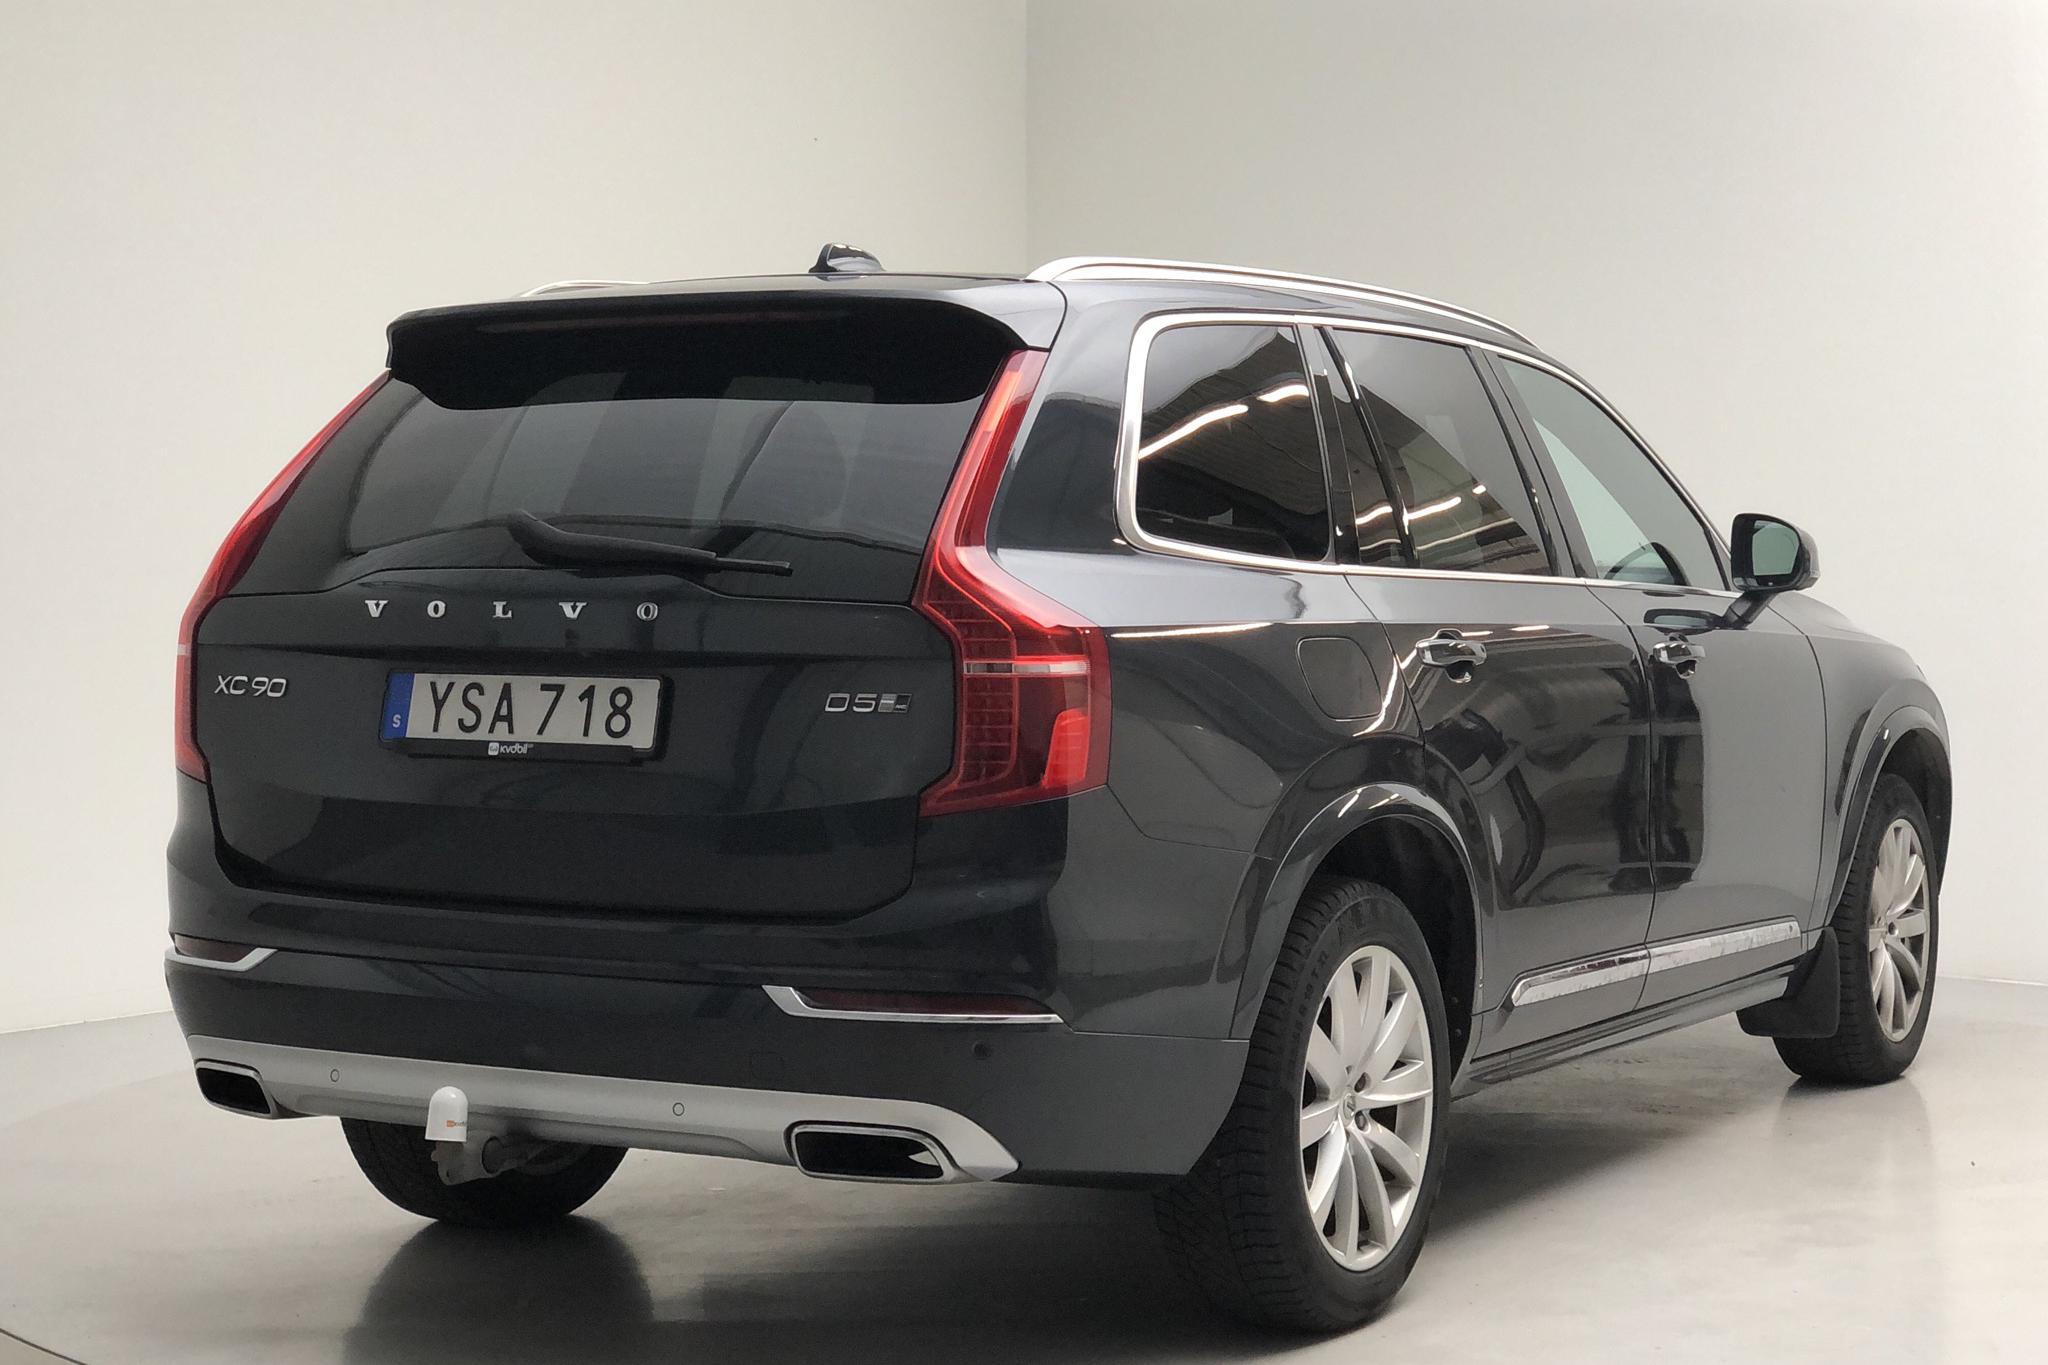 Volvo XC90 D5 AWD (235hk) - 71 290 km - Automatic - gray - 2018